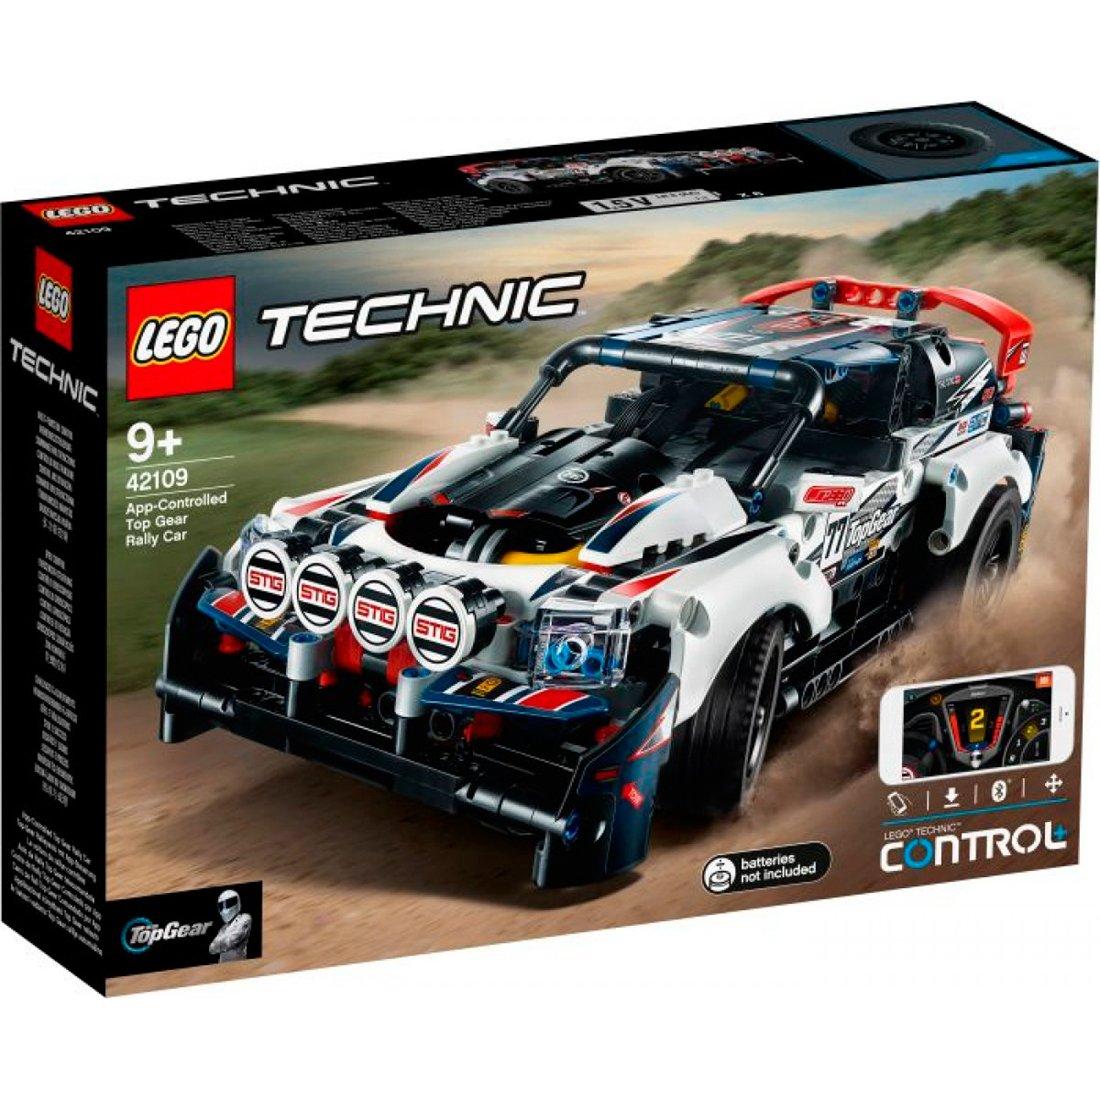 LEGO® Technic Top-Gear Ralleyauto mit App-Steuerung 42109